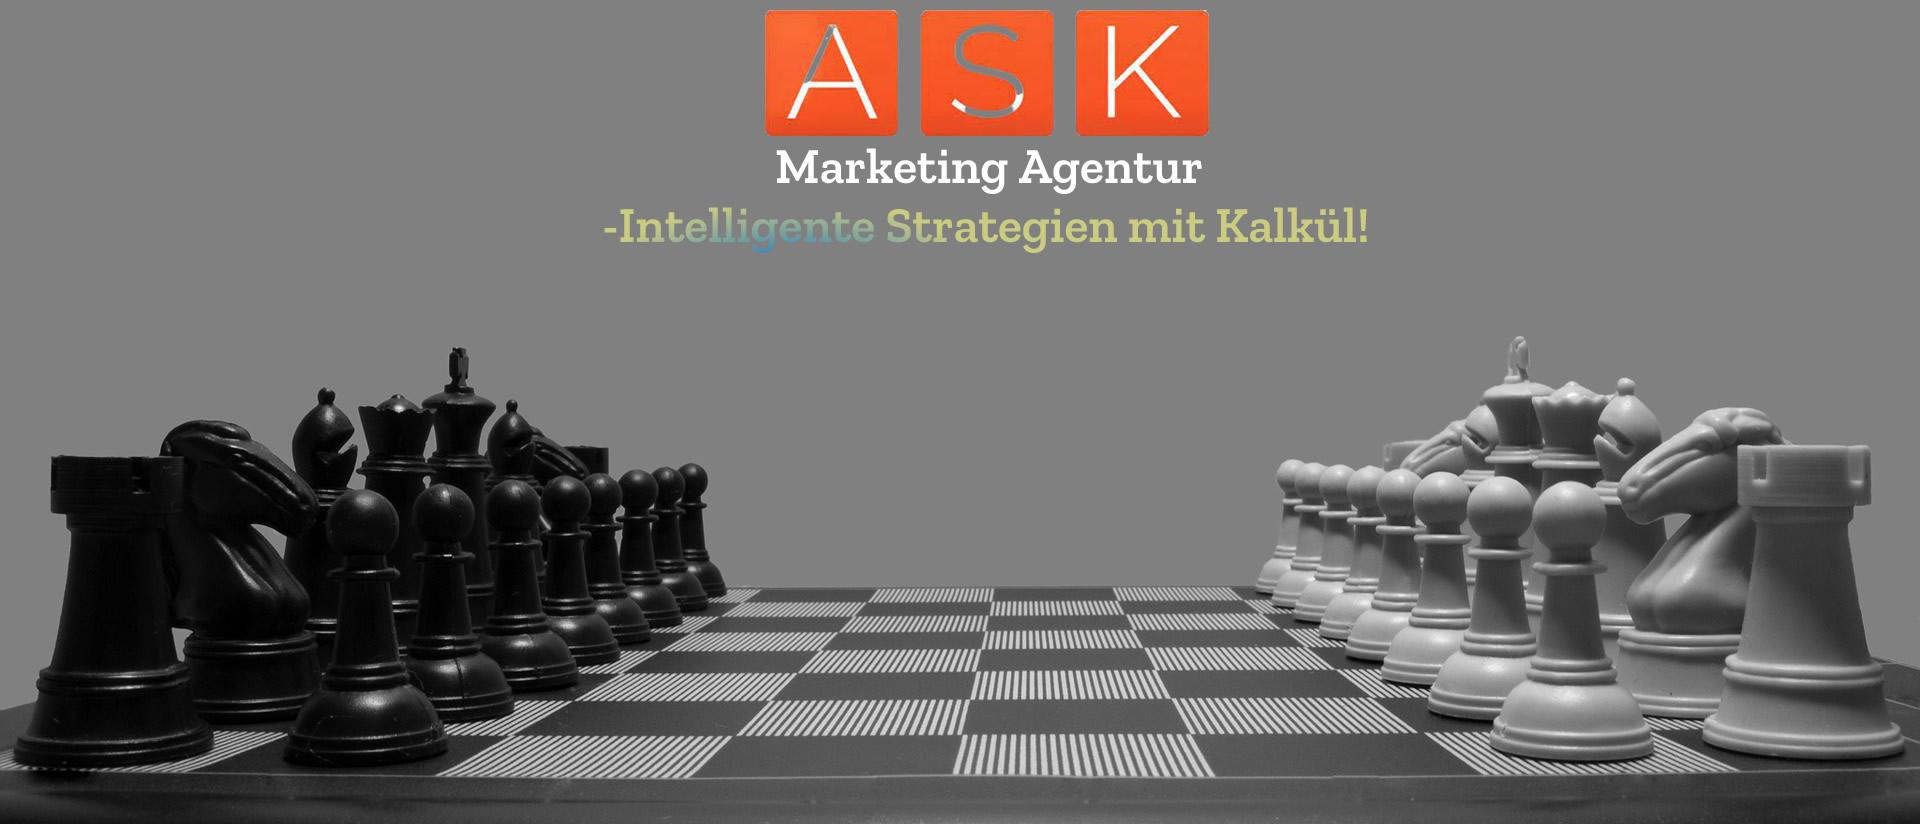 Marketing Agentur Hannover SEO Internetagentur ASK.